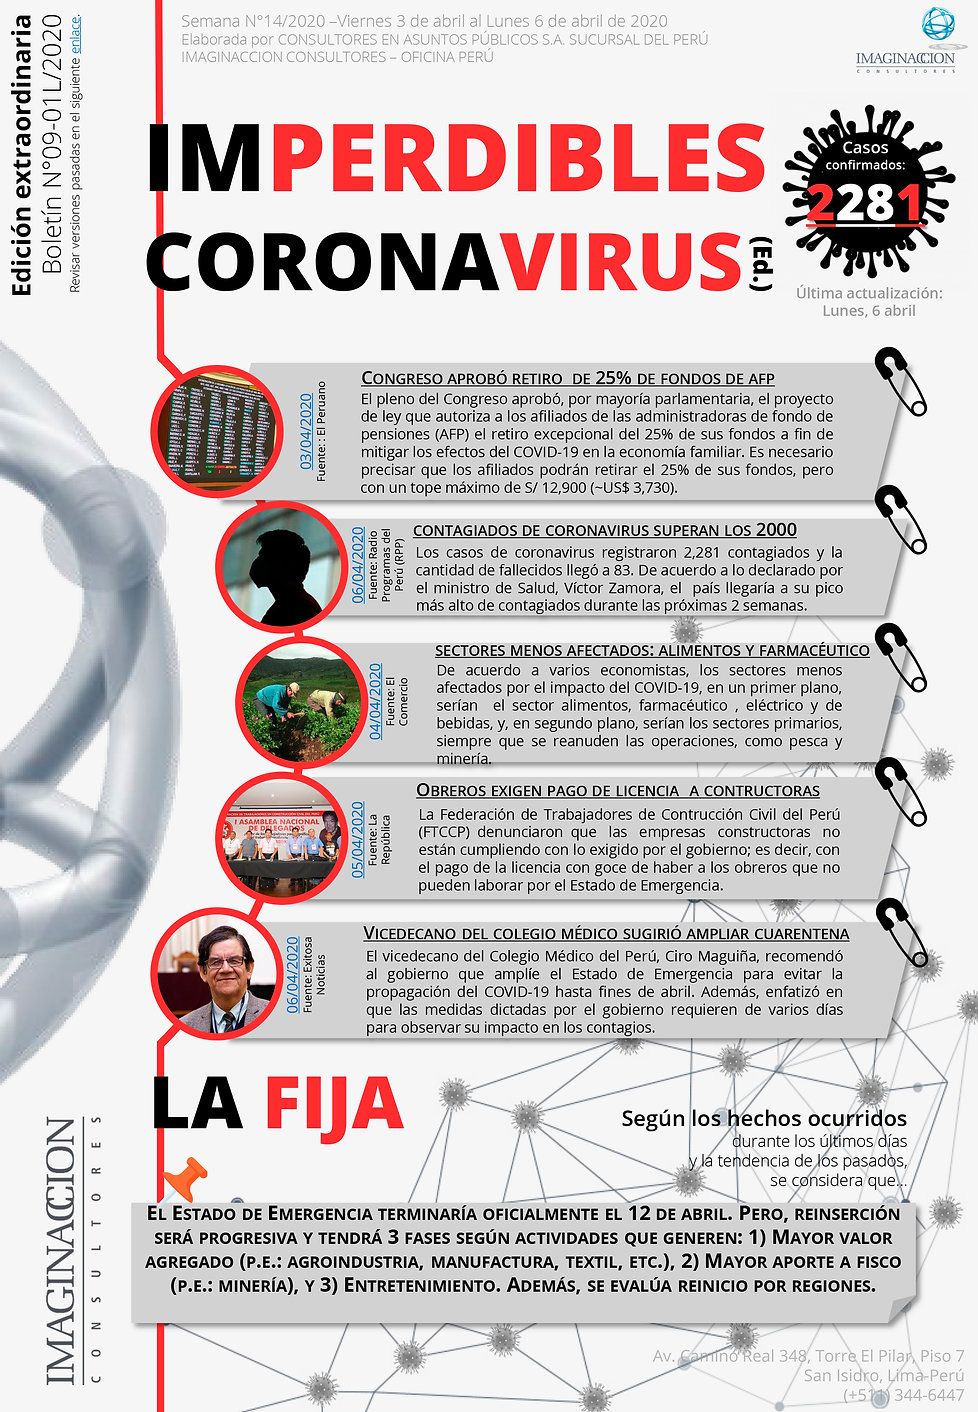 009-01L-2020_-_BOLETÍN_CORONAVIRUS_N°